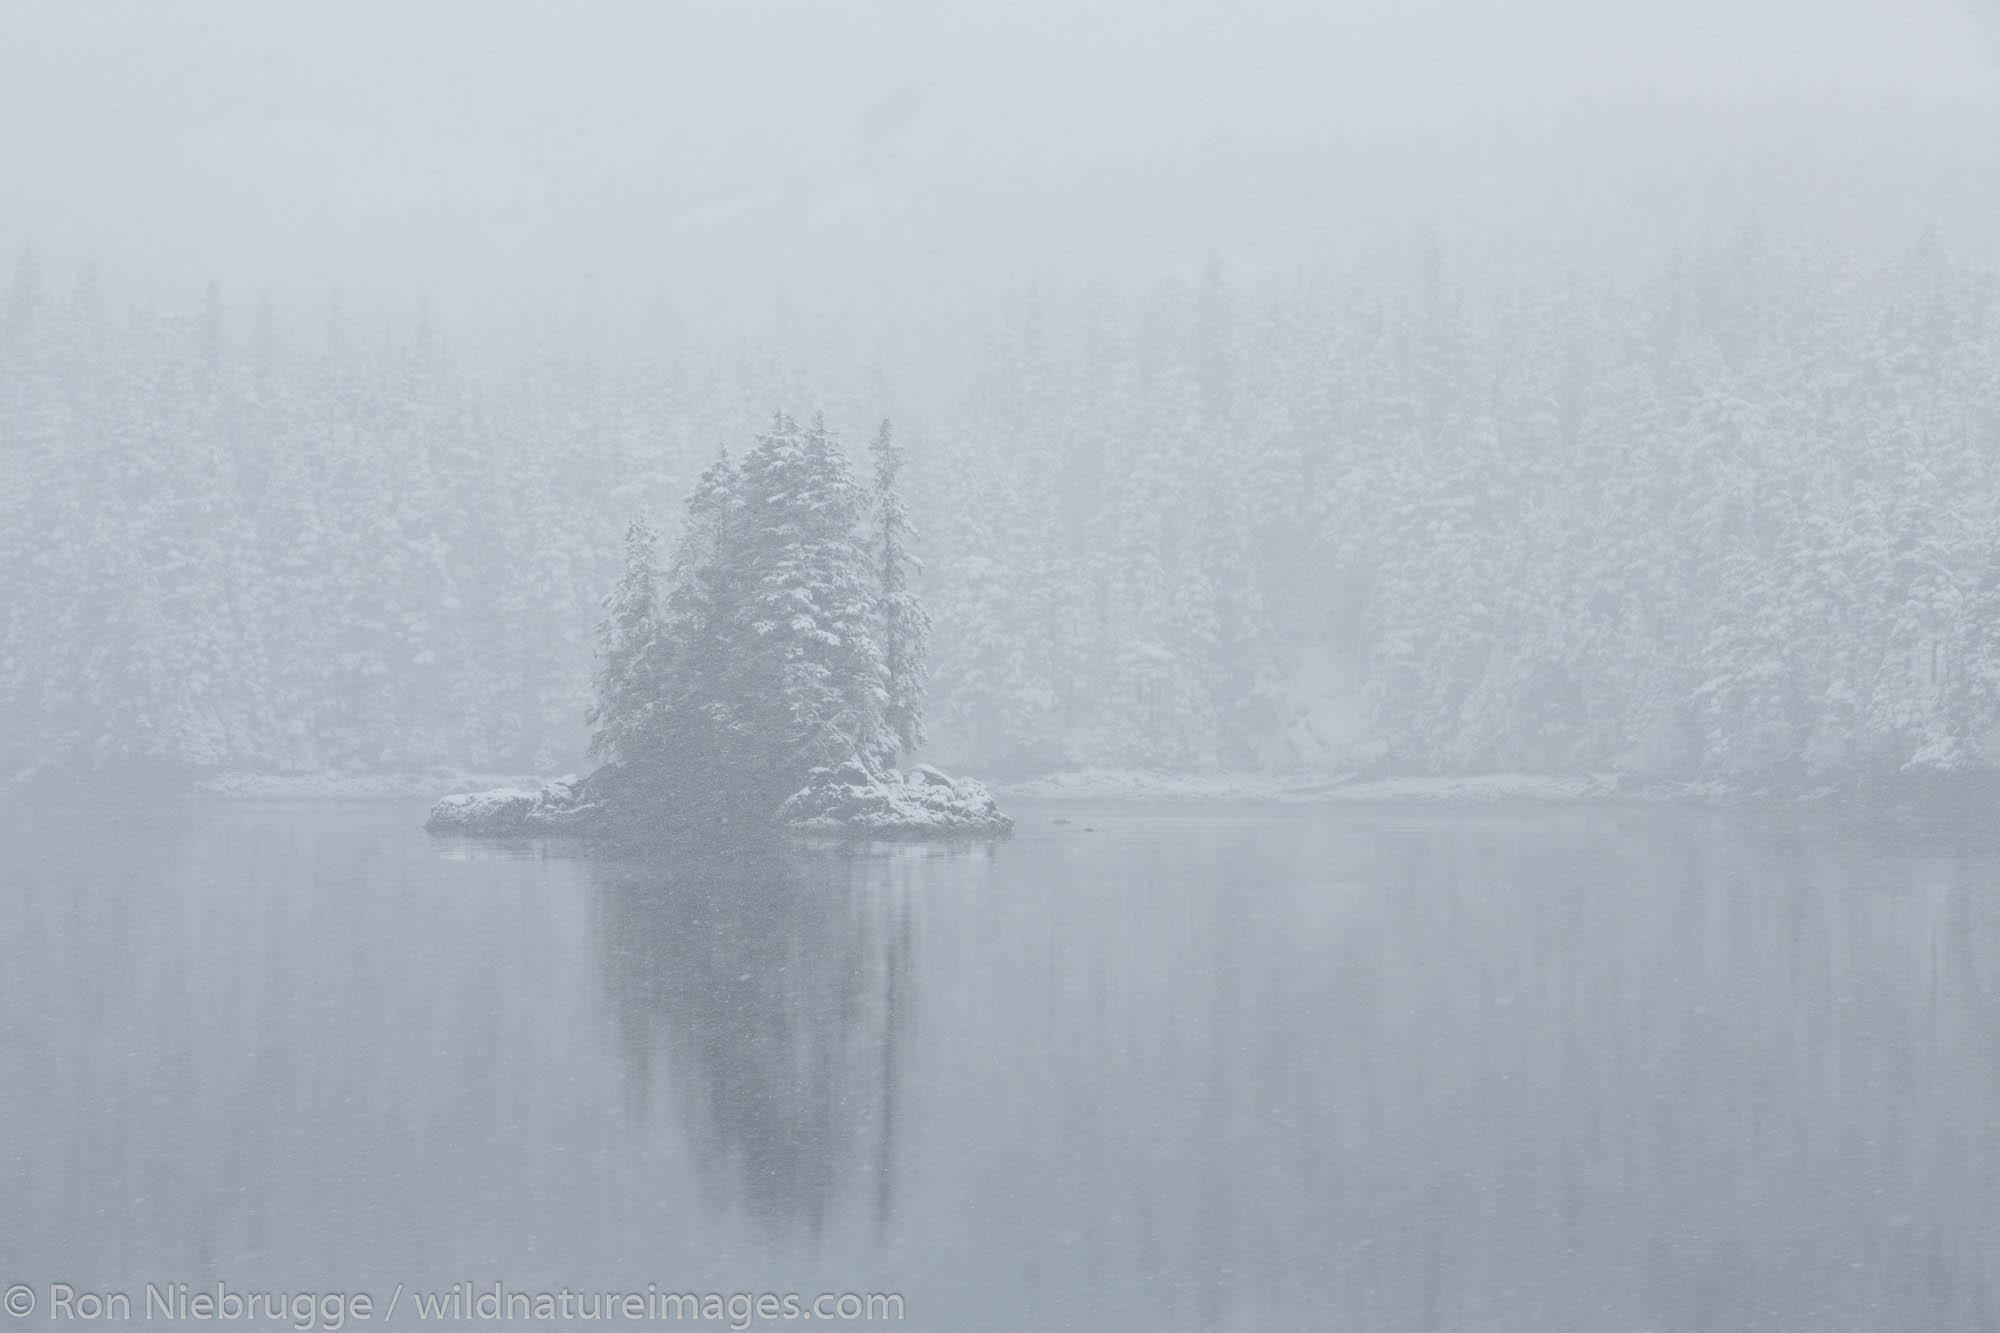 Snow in Culross Passage, Prince William Sound, Chugach National Forest, Alaska.